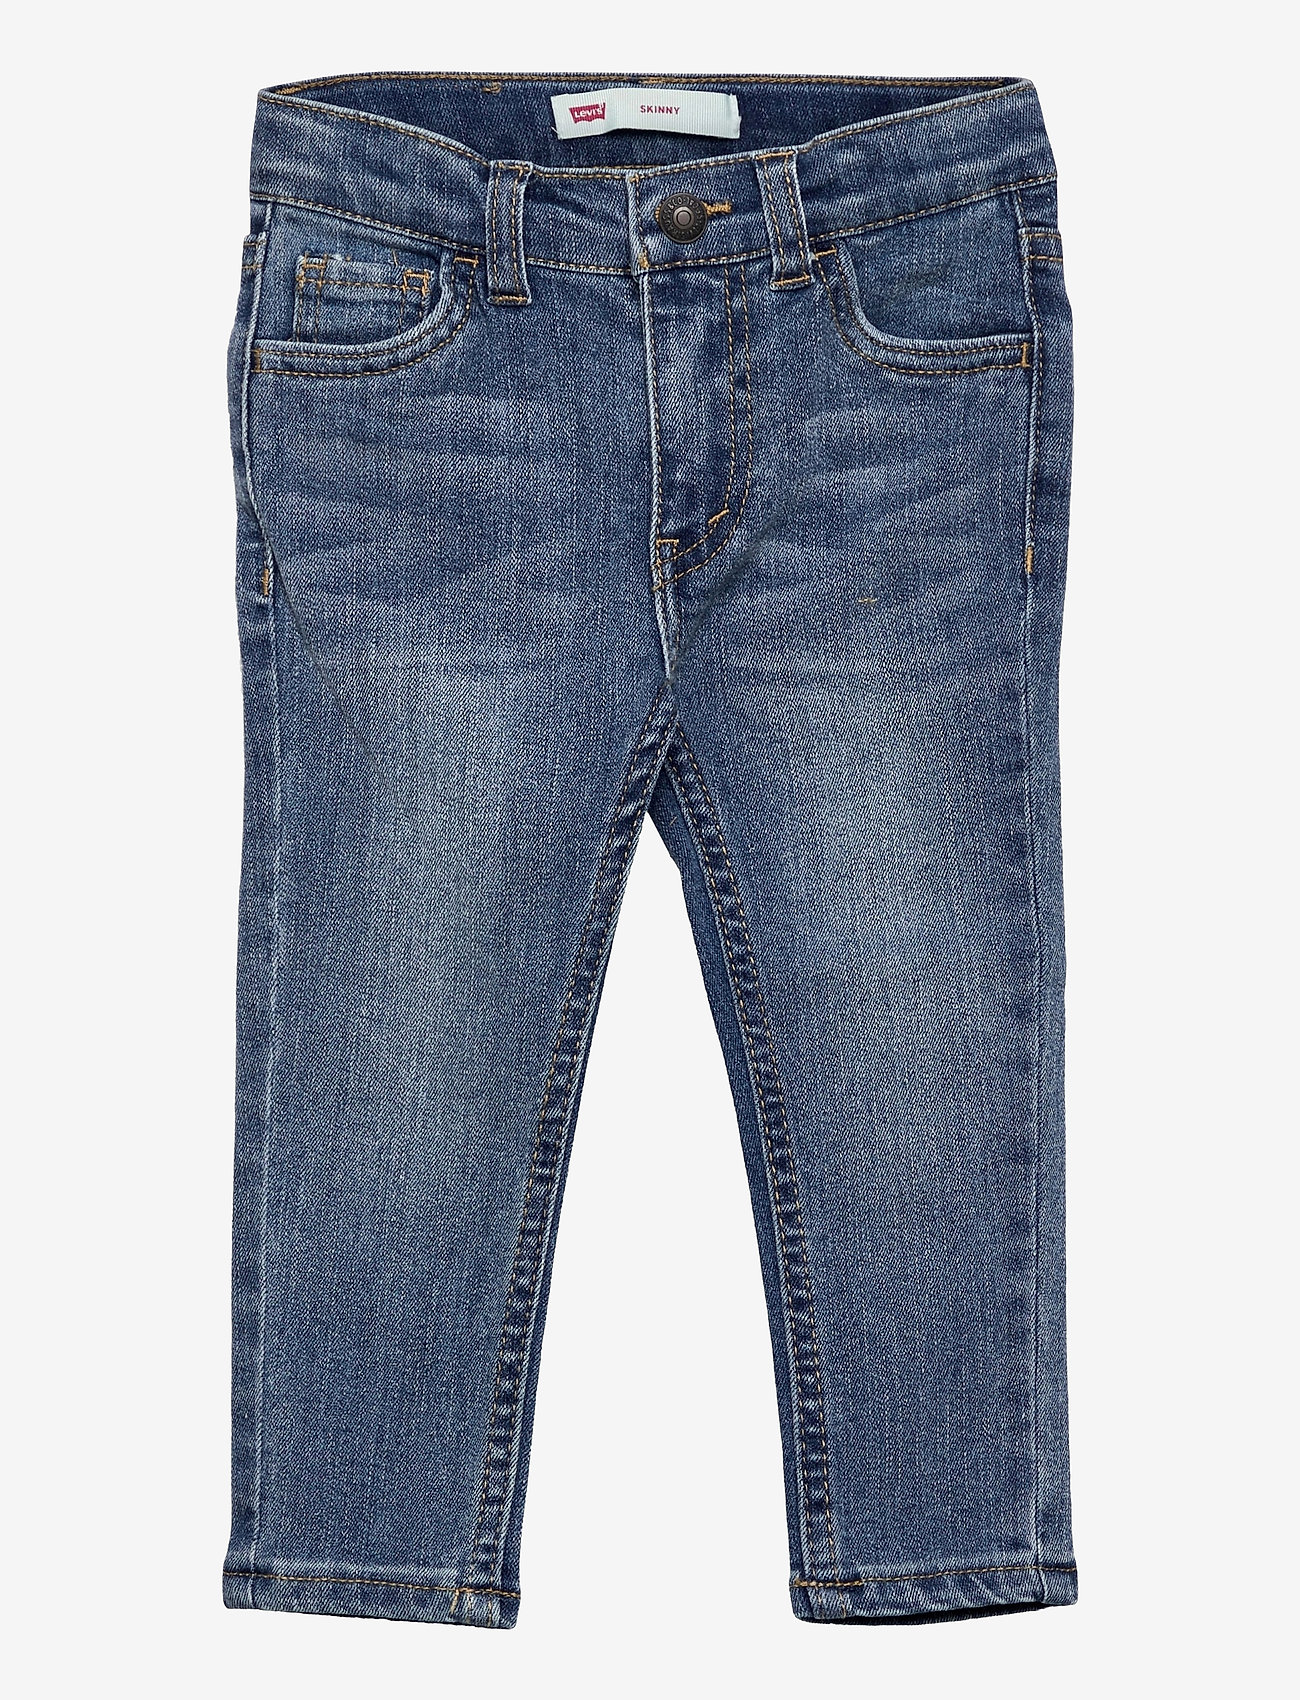 Levi's - SKINNY DENIM JEANS - jeans - milestone - 0